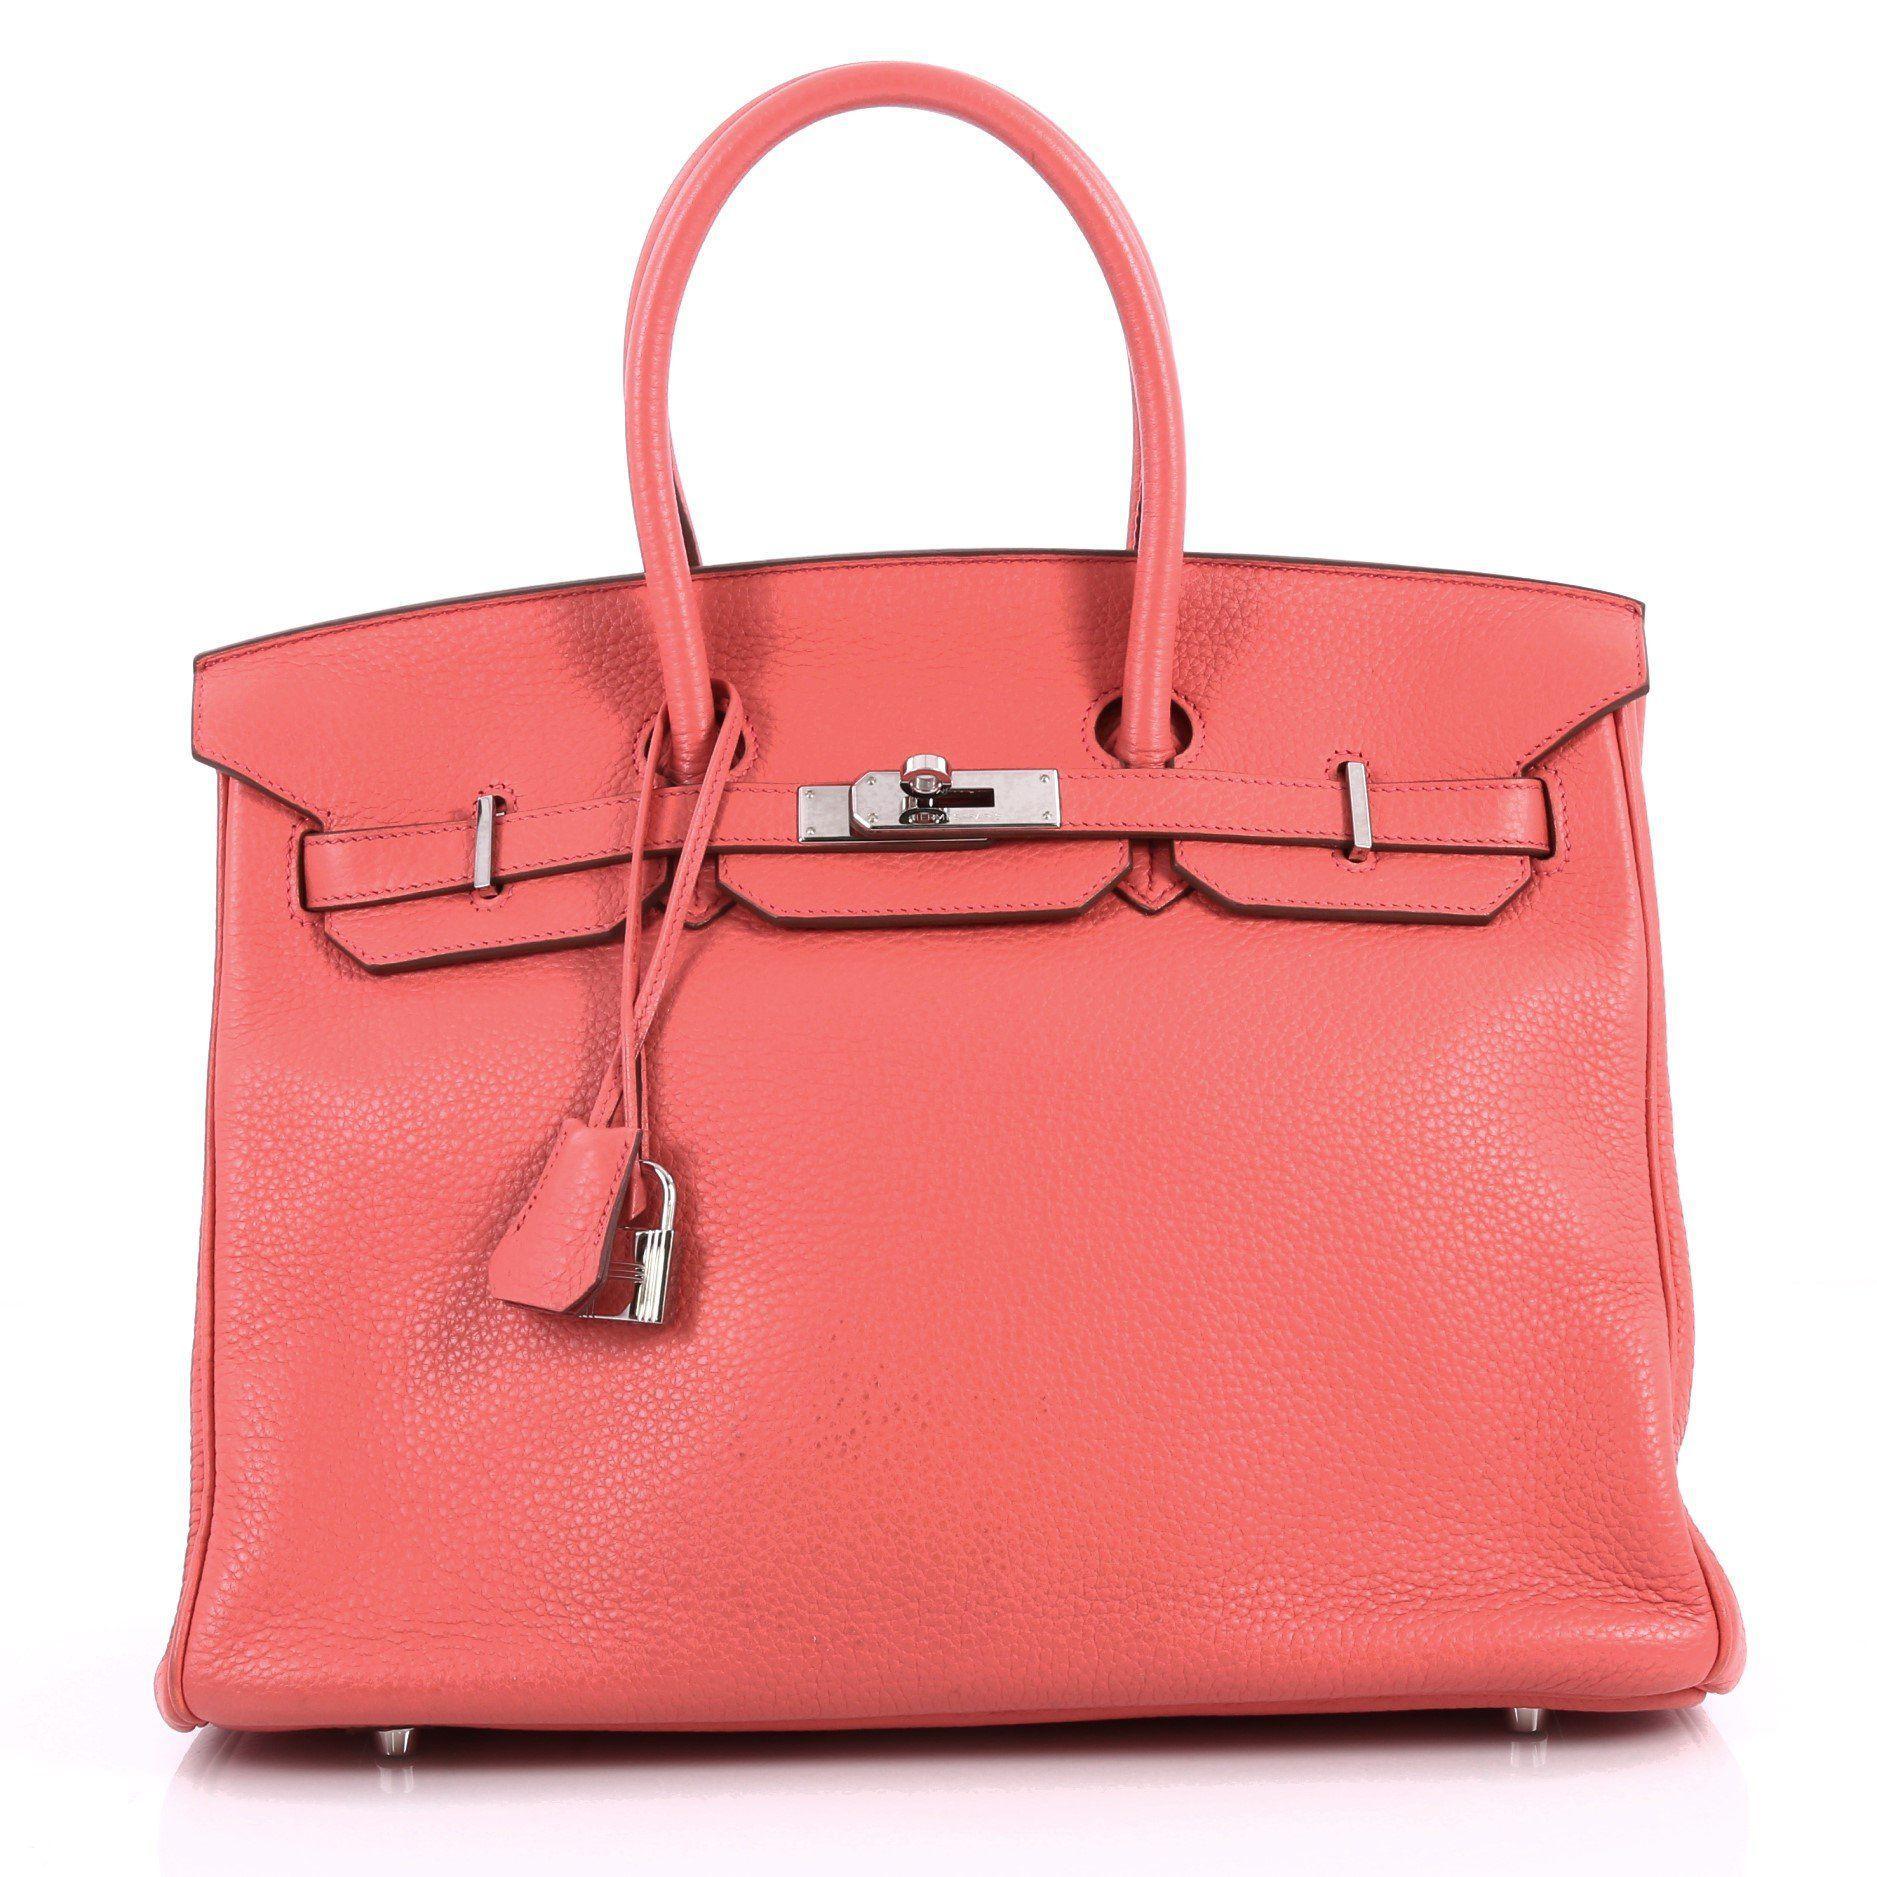 Hermès. Women s Pink Pre Owned Birkin Handbag Bougainvillea Clemence With Palladium  Hardware 35 9c0c441dcd500